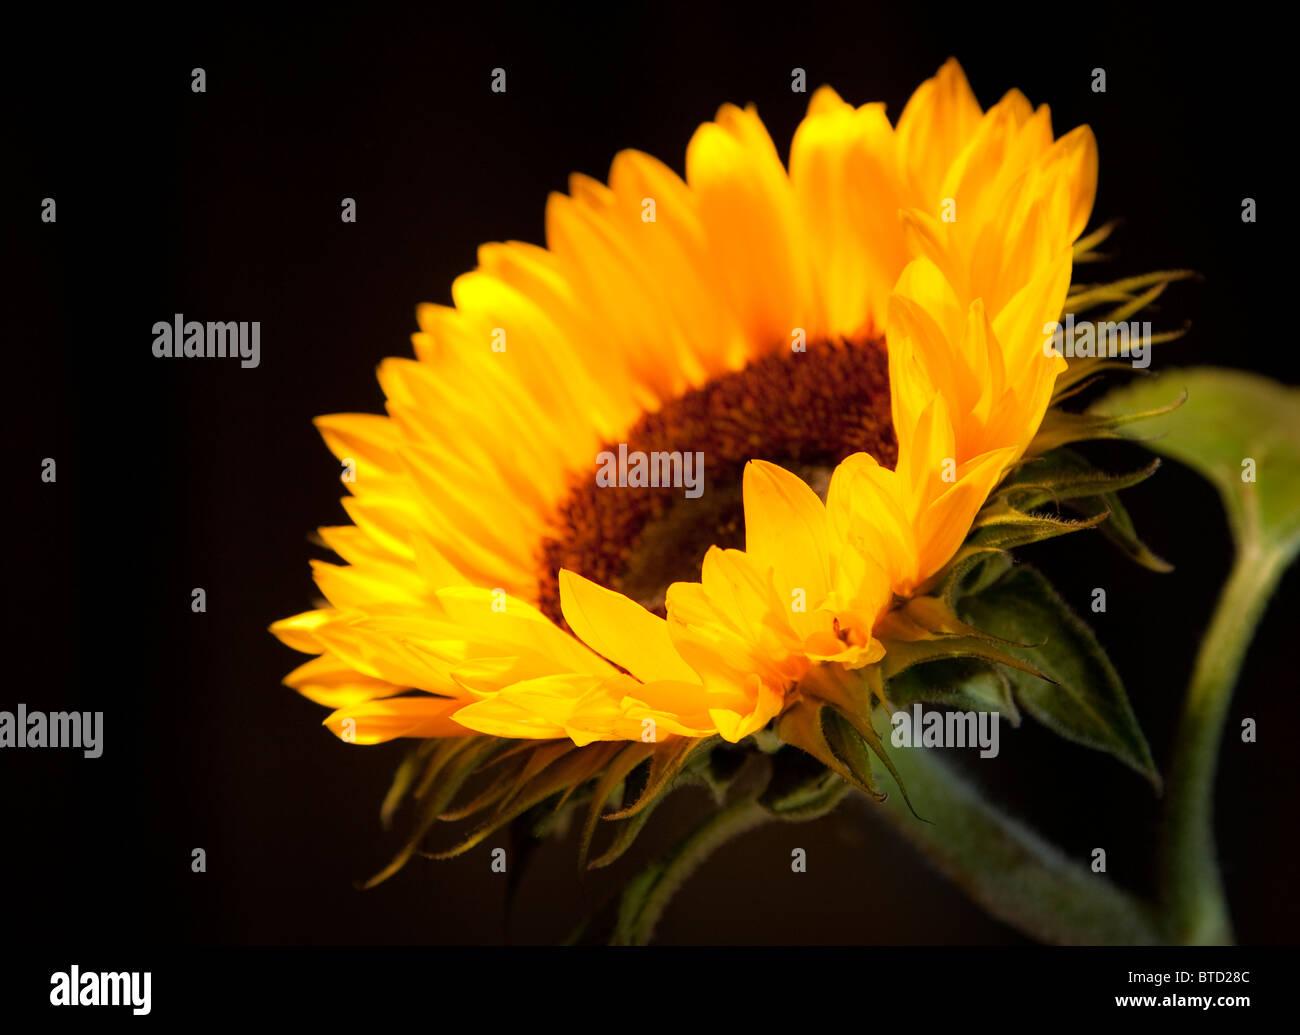 Sunflower against black background - Stock Image